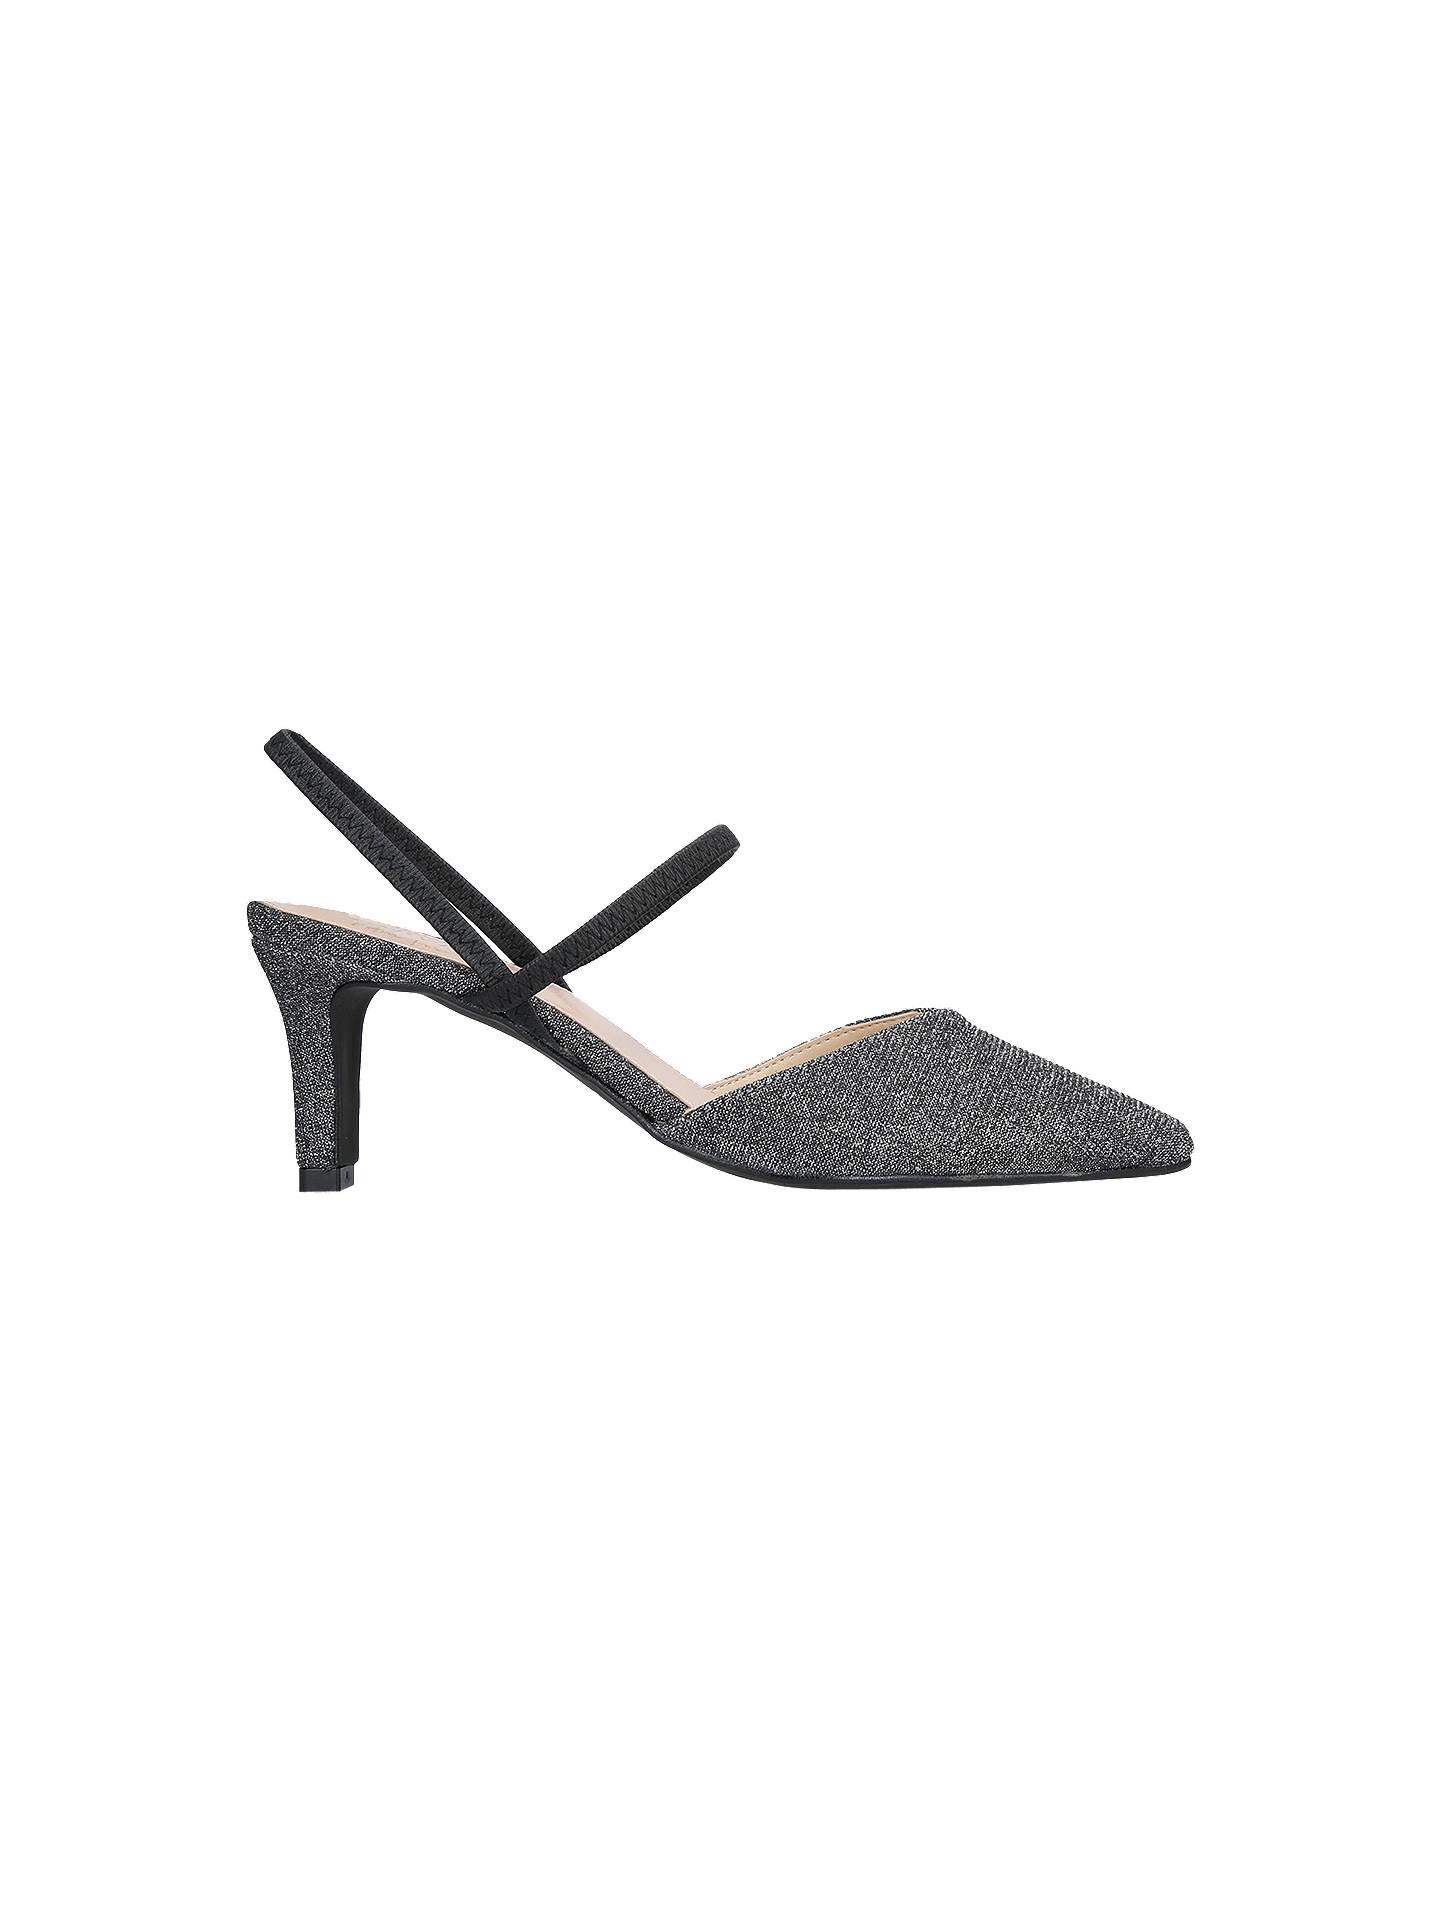 564bfc142bf8 BuyCarvela Asya Kitten Heel Slingback Court Shoes